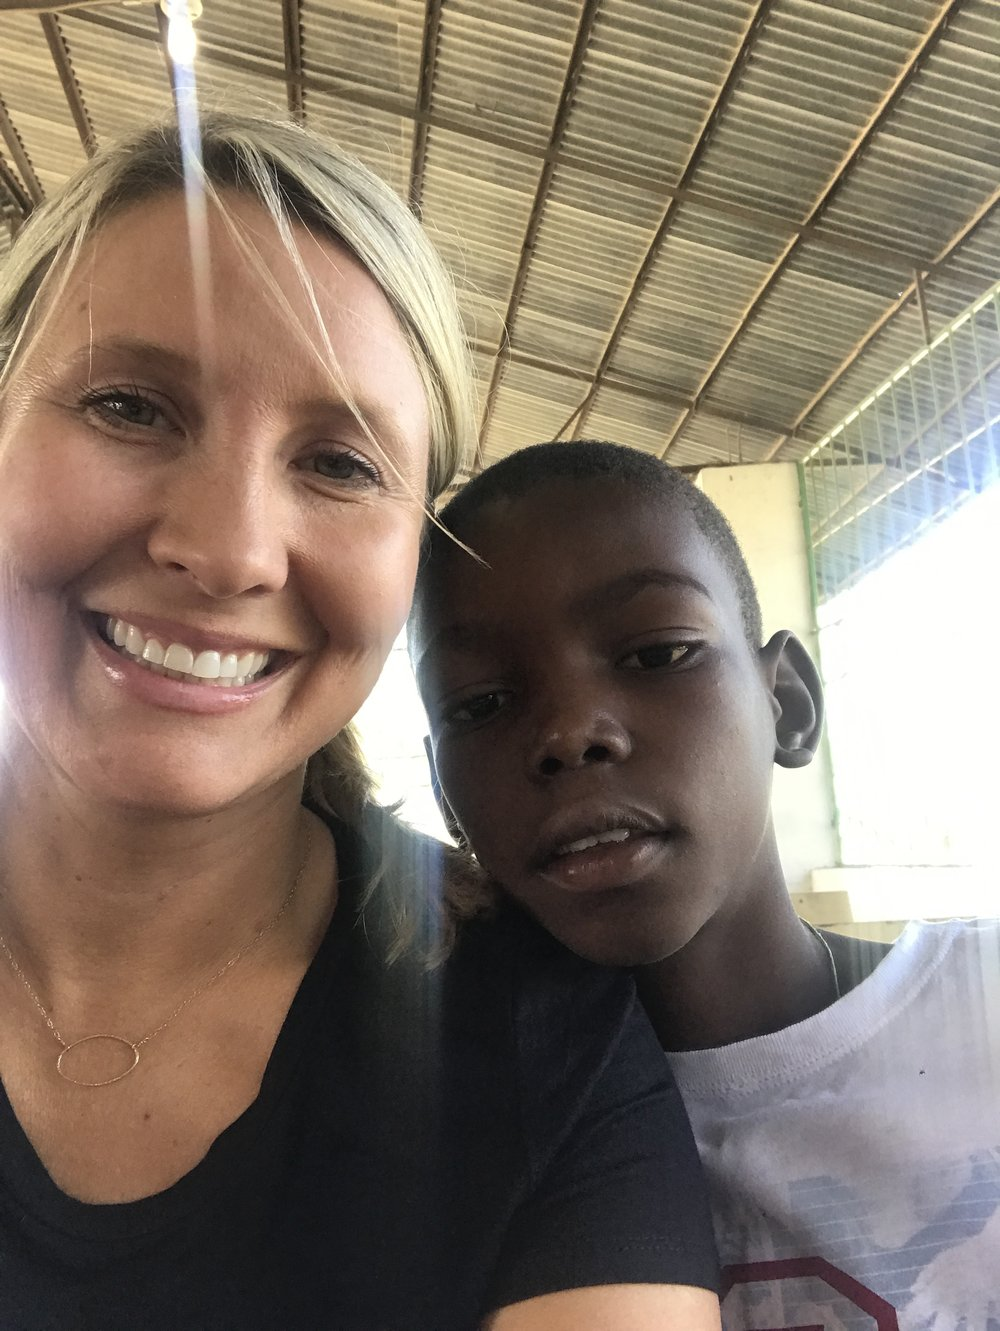 The little Haitian boy who friended me before church